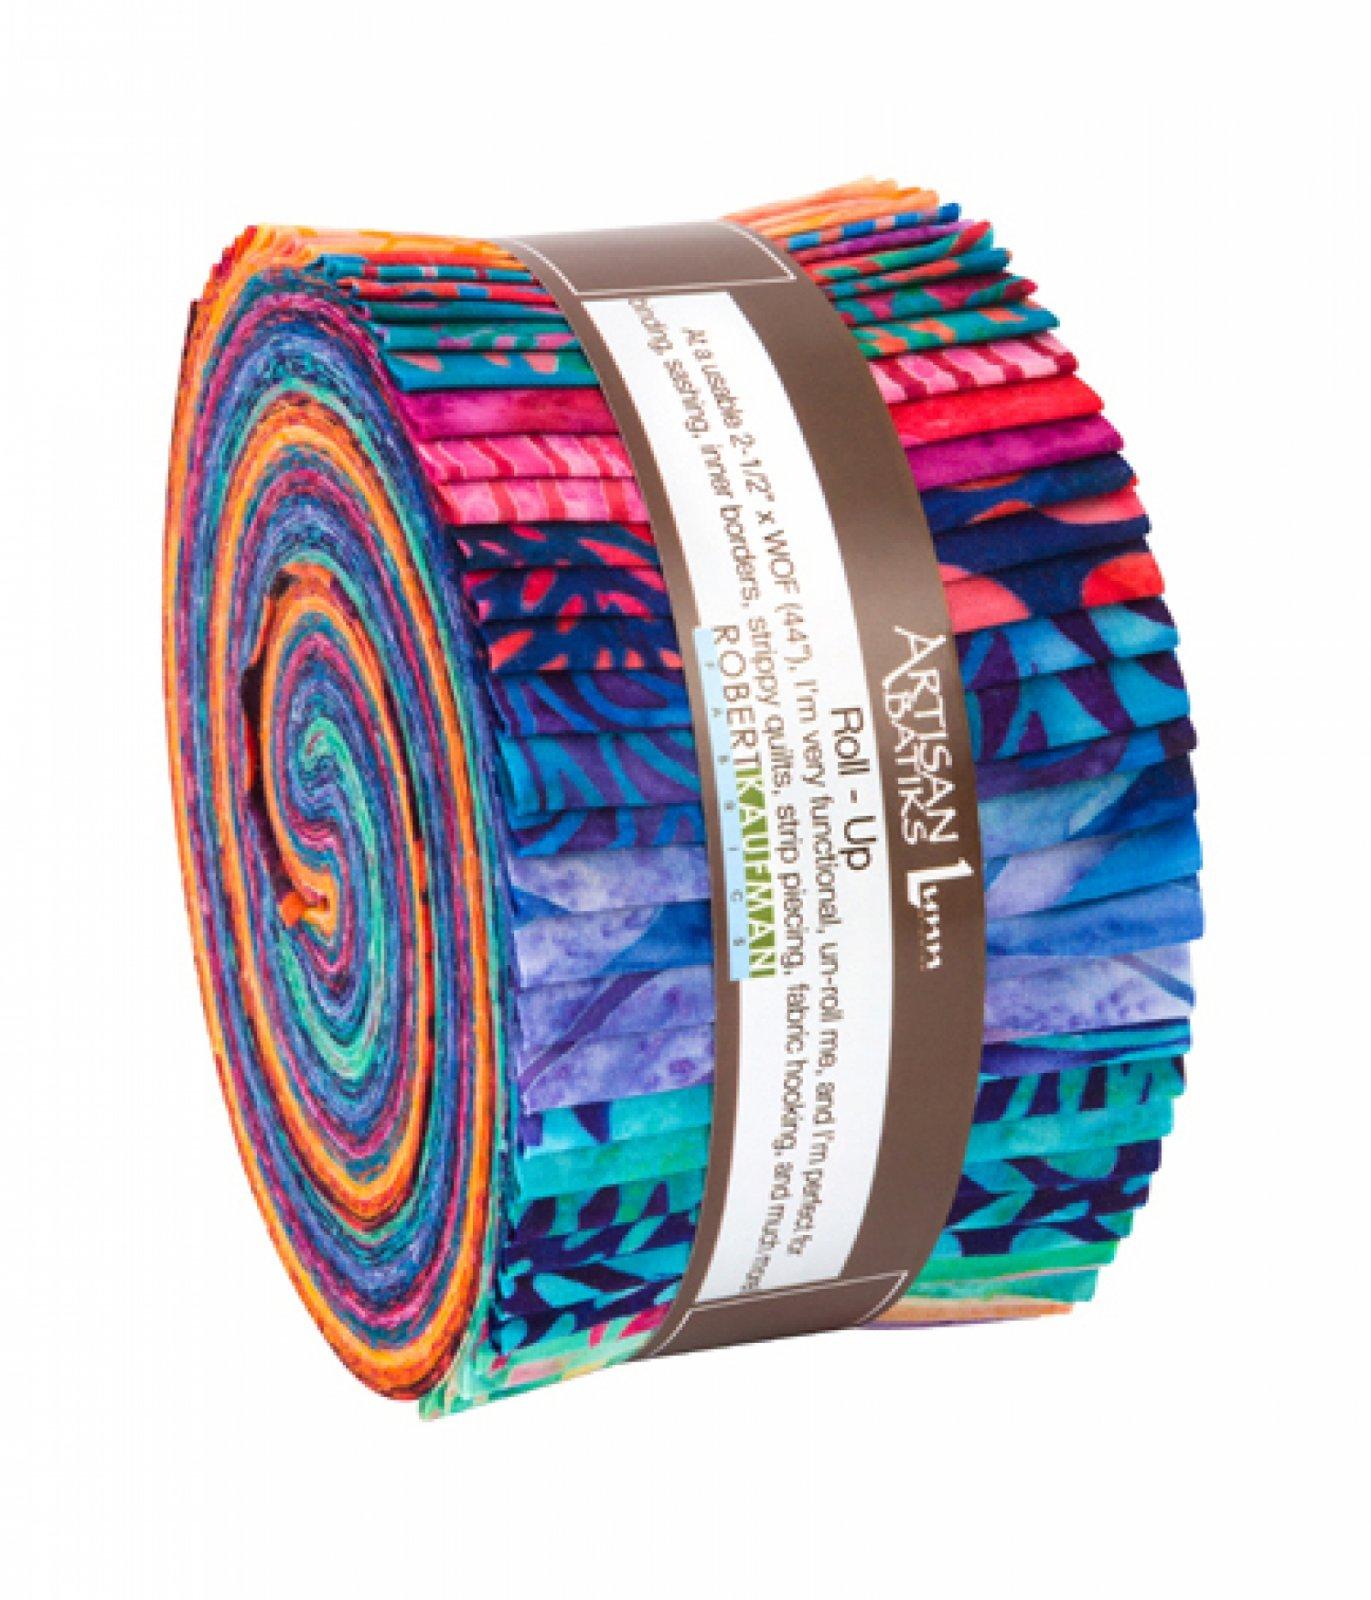 Artisan Batiks:Optical Illusion Roll Up